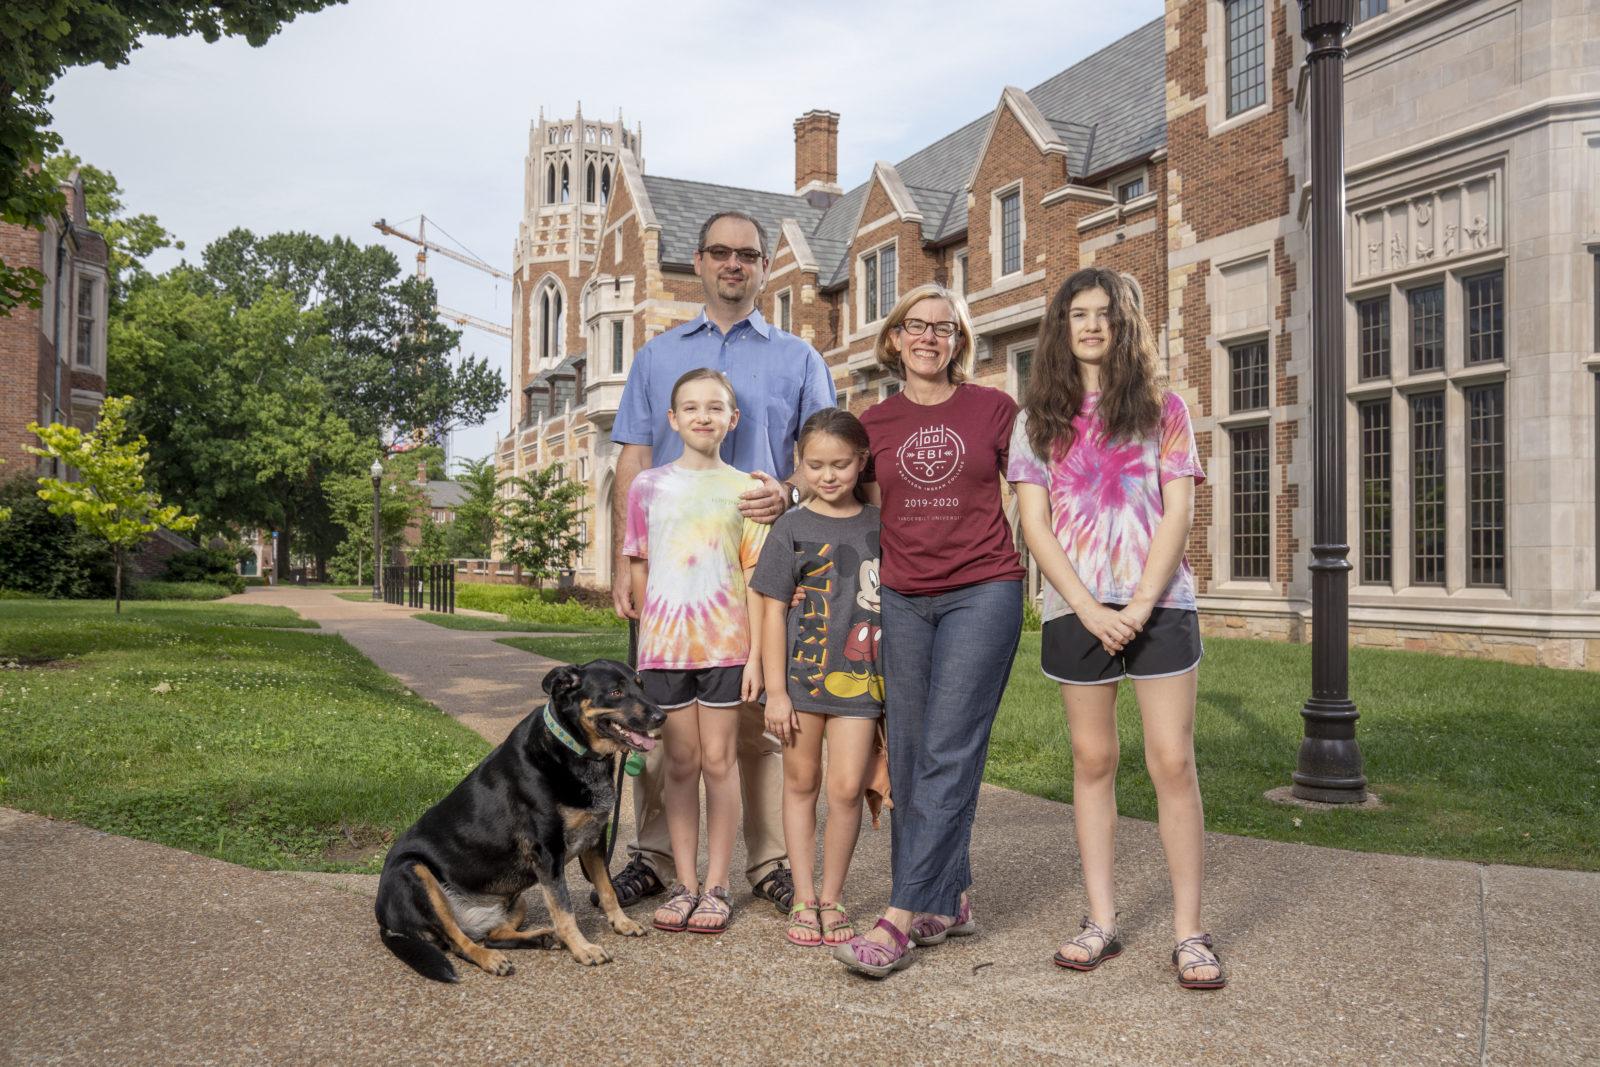 Sarah Igo (second from right), faculty head of E. Bronson Ingram College, with her family. (John Russell/Vanderbilt)